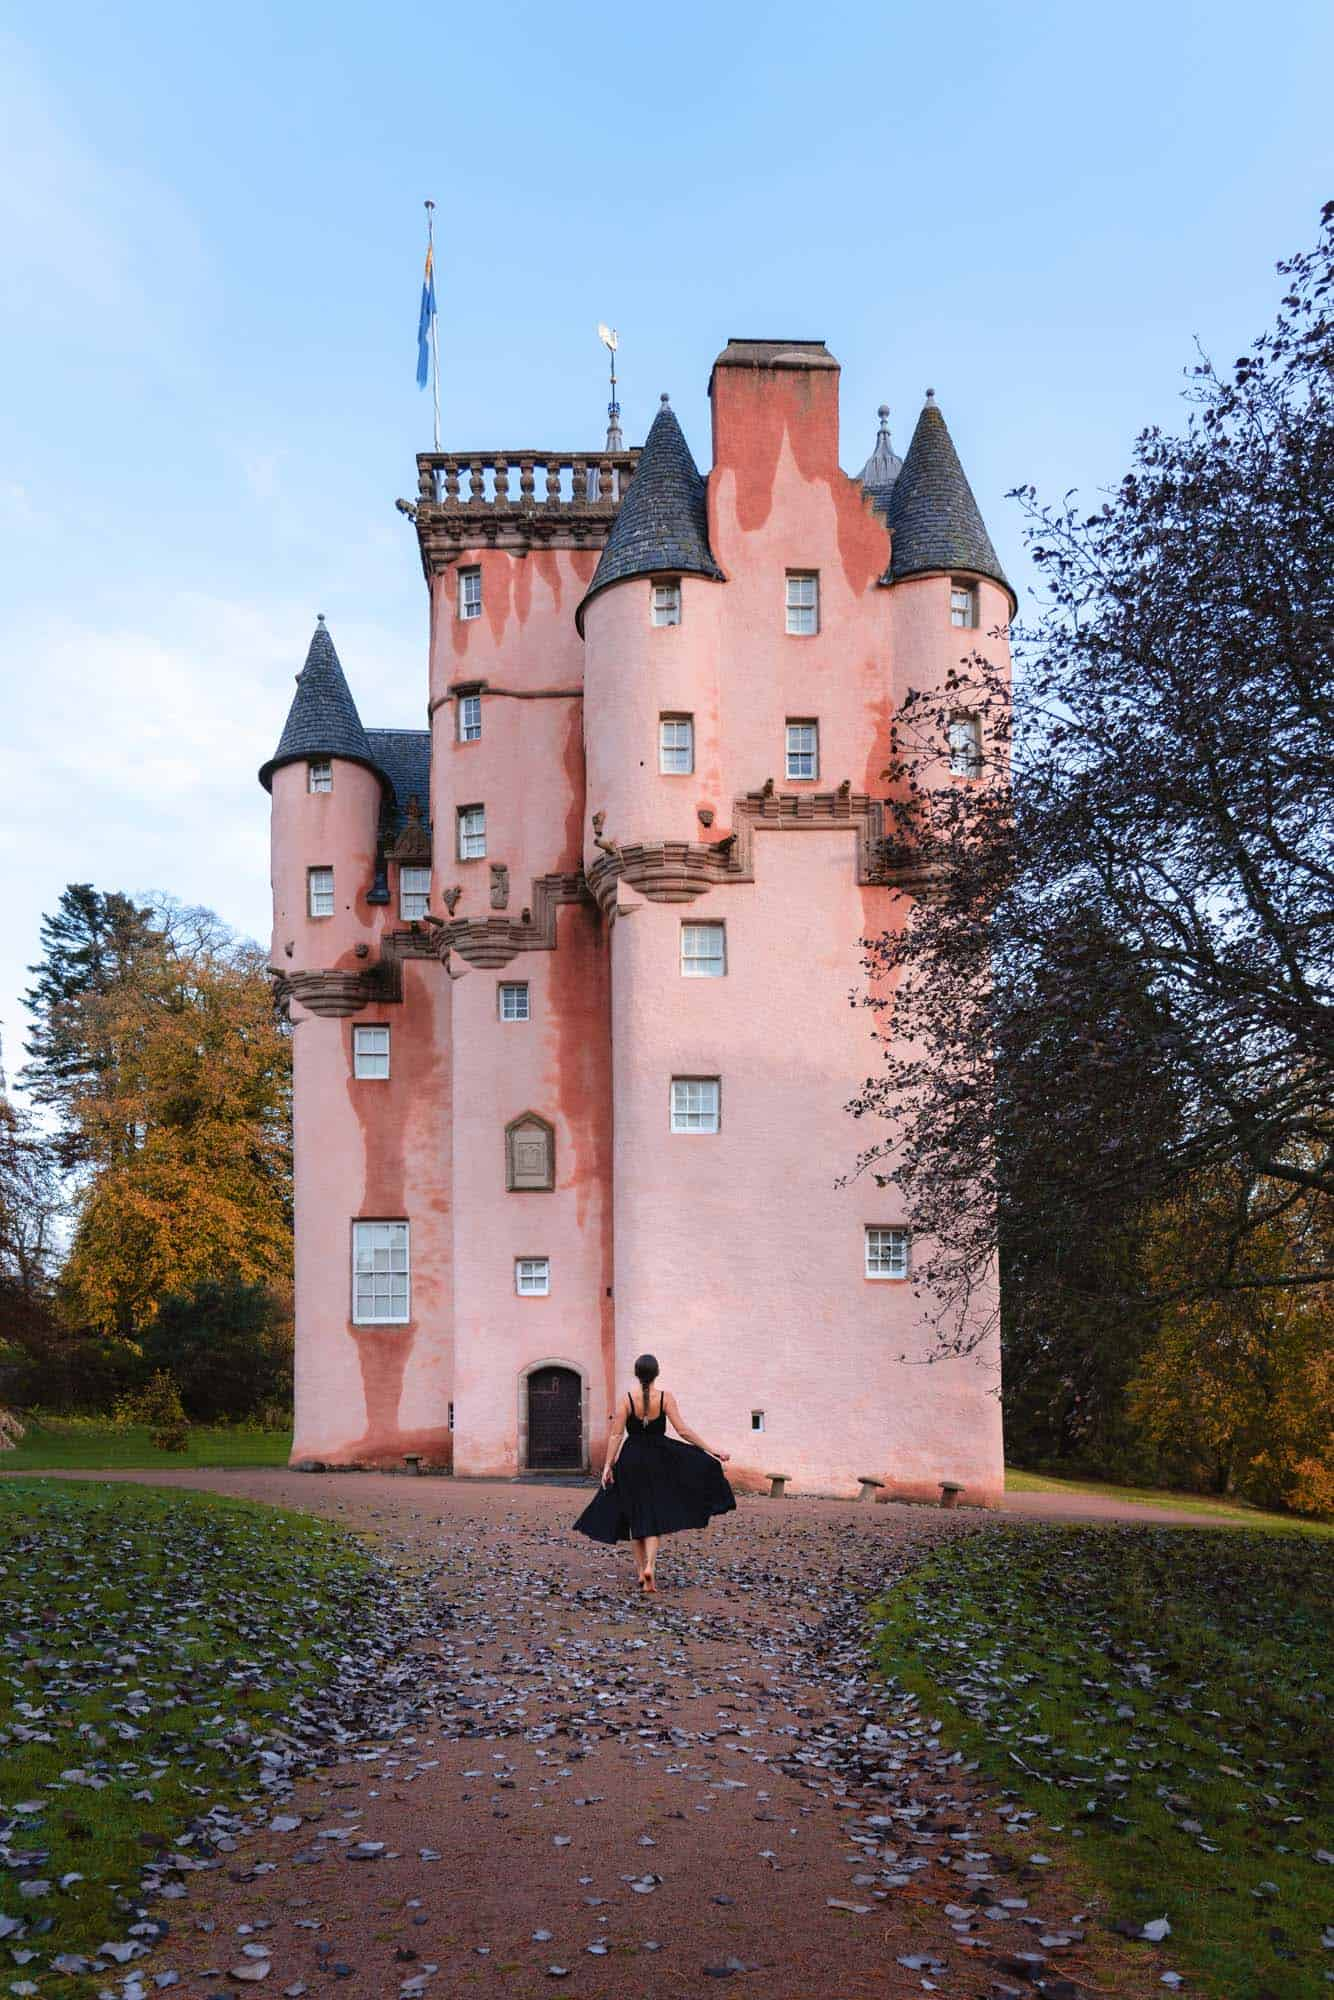 Standing in front of Craigievar Castle, aka the Cinderella Castle.